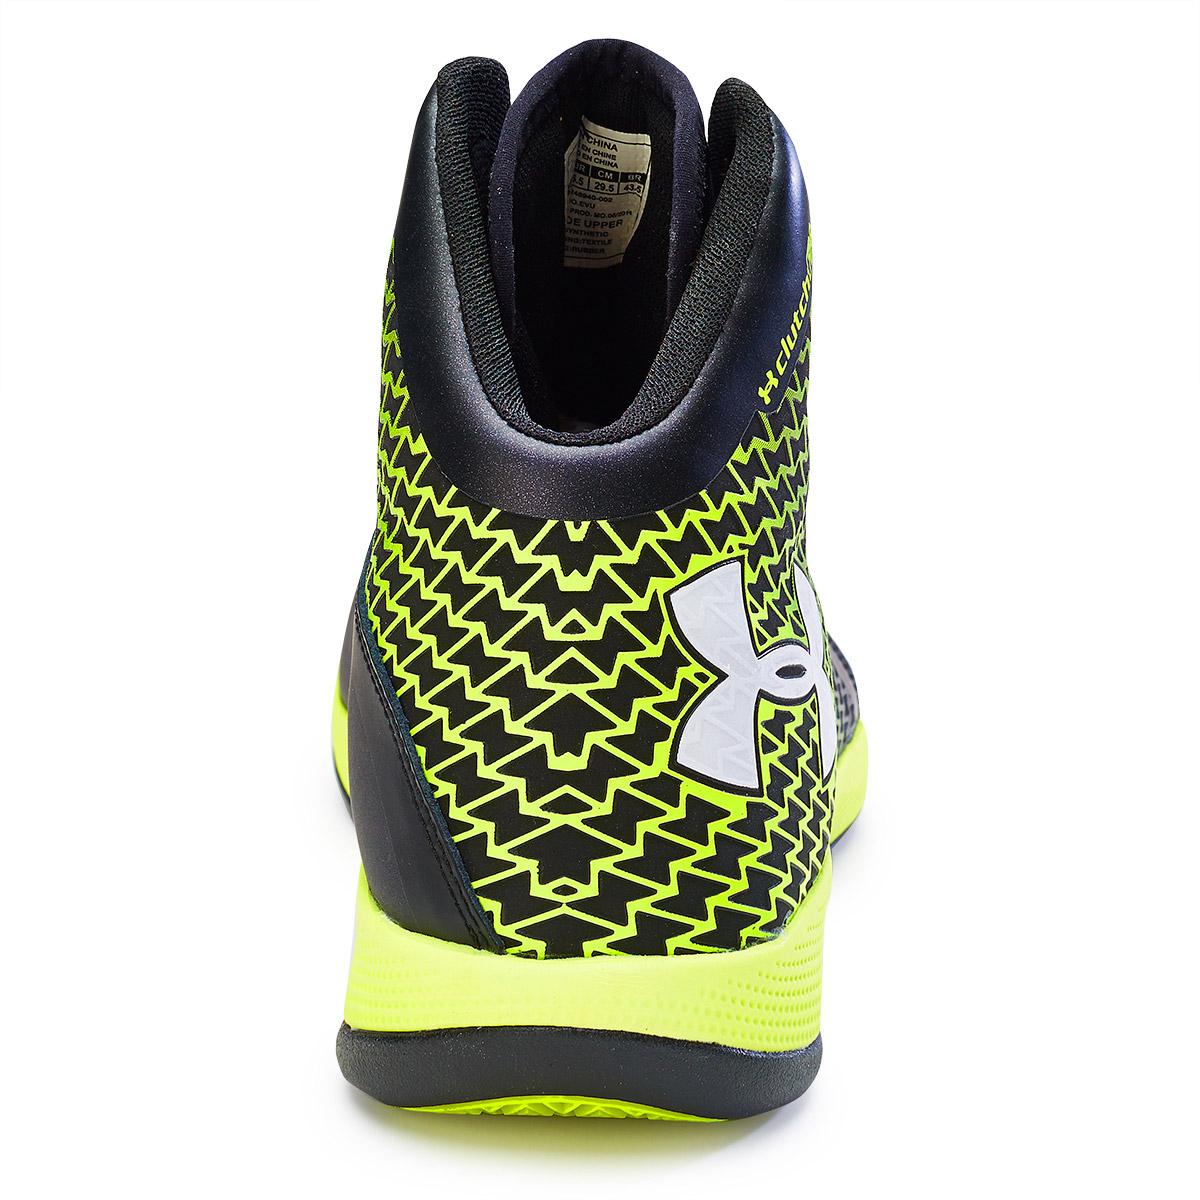 finest selection d03c7 e0ac6 UNDER ARMOUR Men's Micro G® Torch Basketball Shoes - Bob's ...